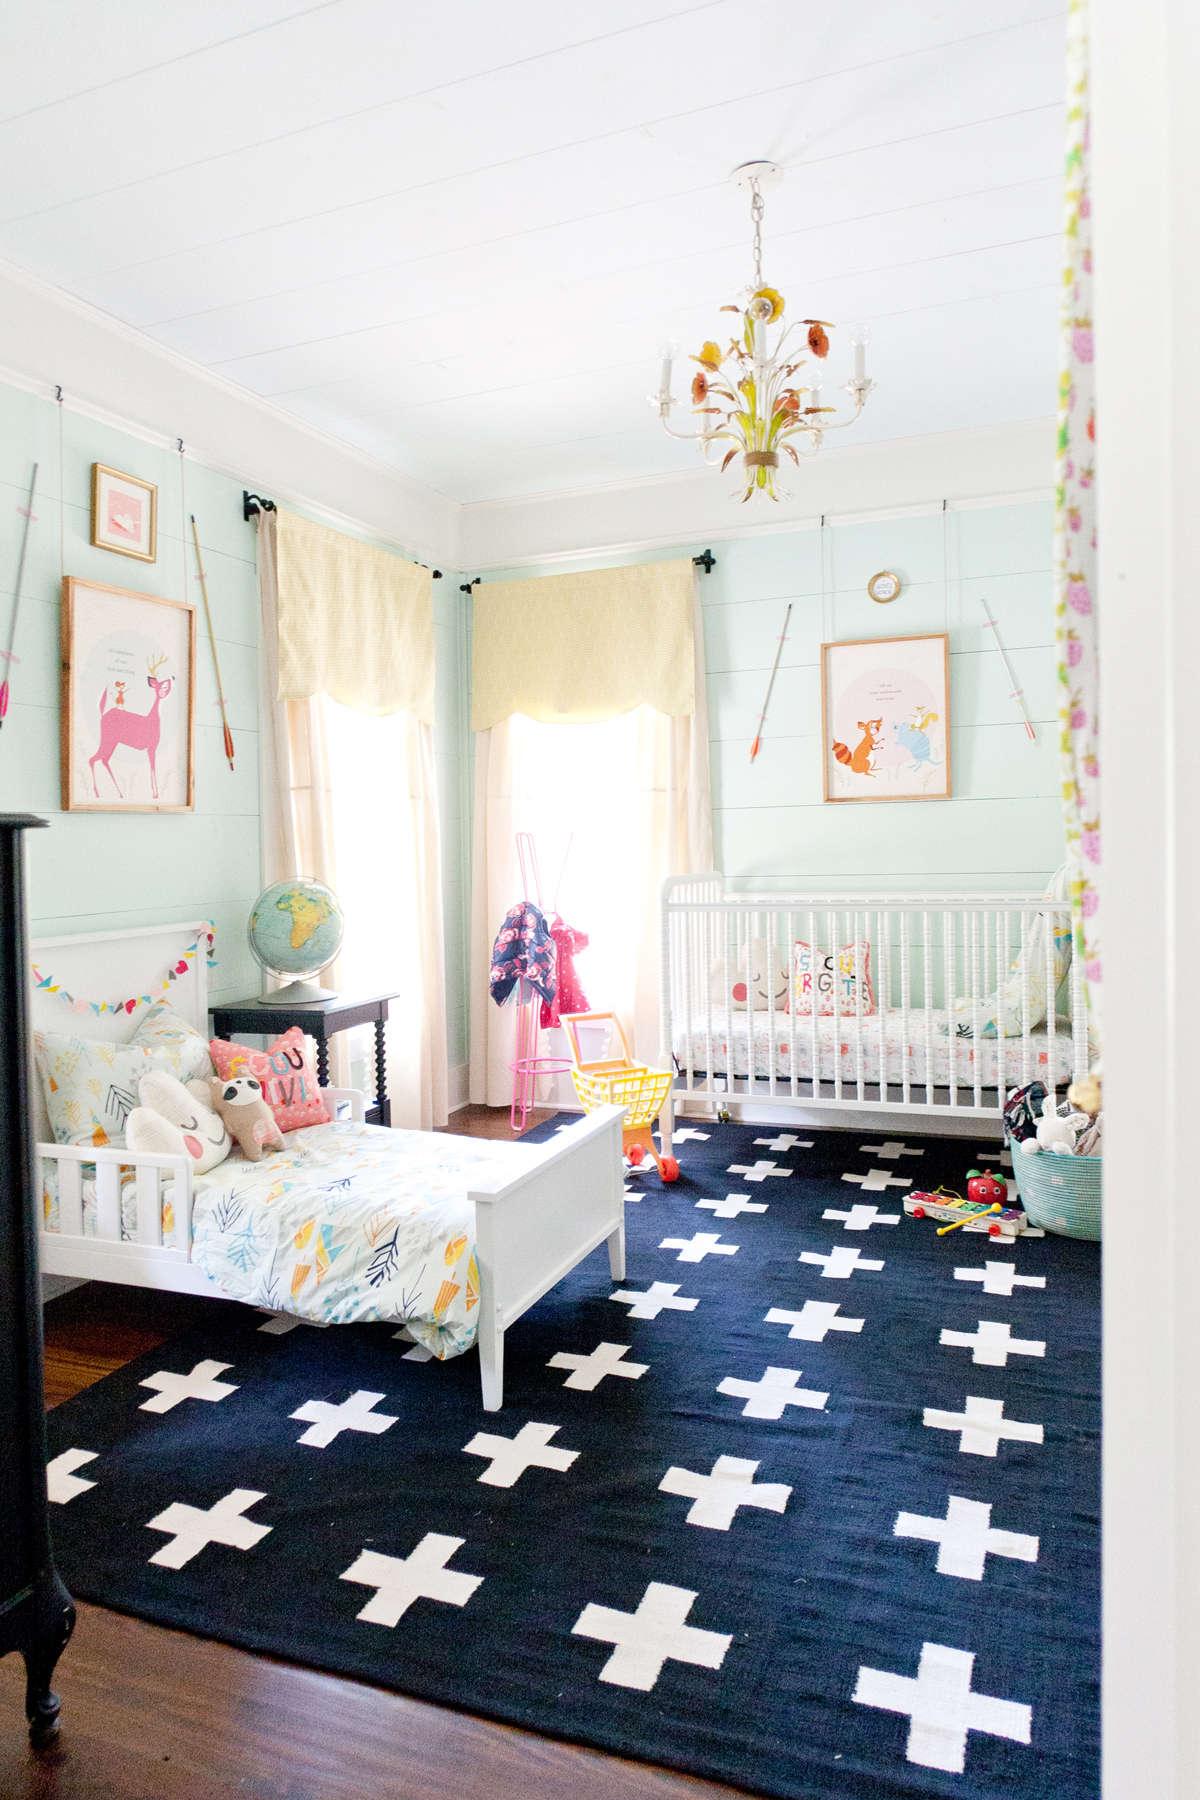 Shared Bedroom Shared Room Inspiration Lay Baby Lay Lay Baby Lay